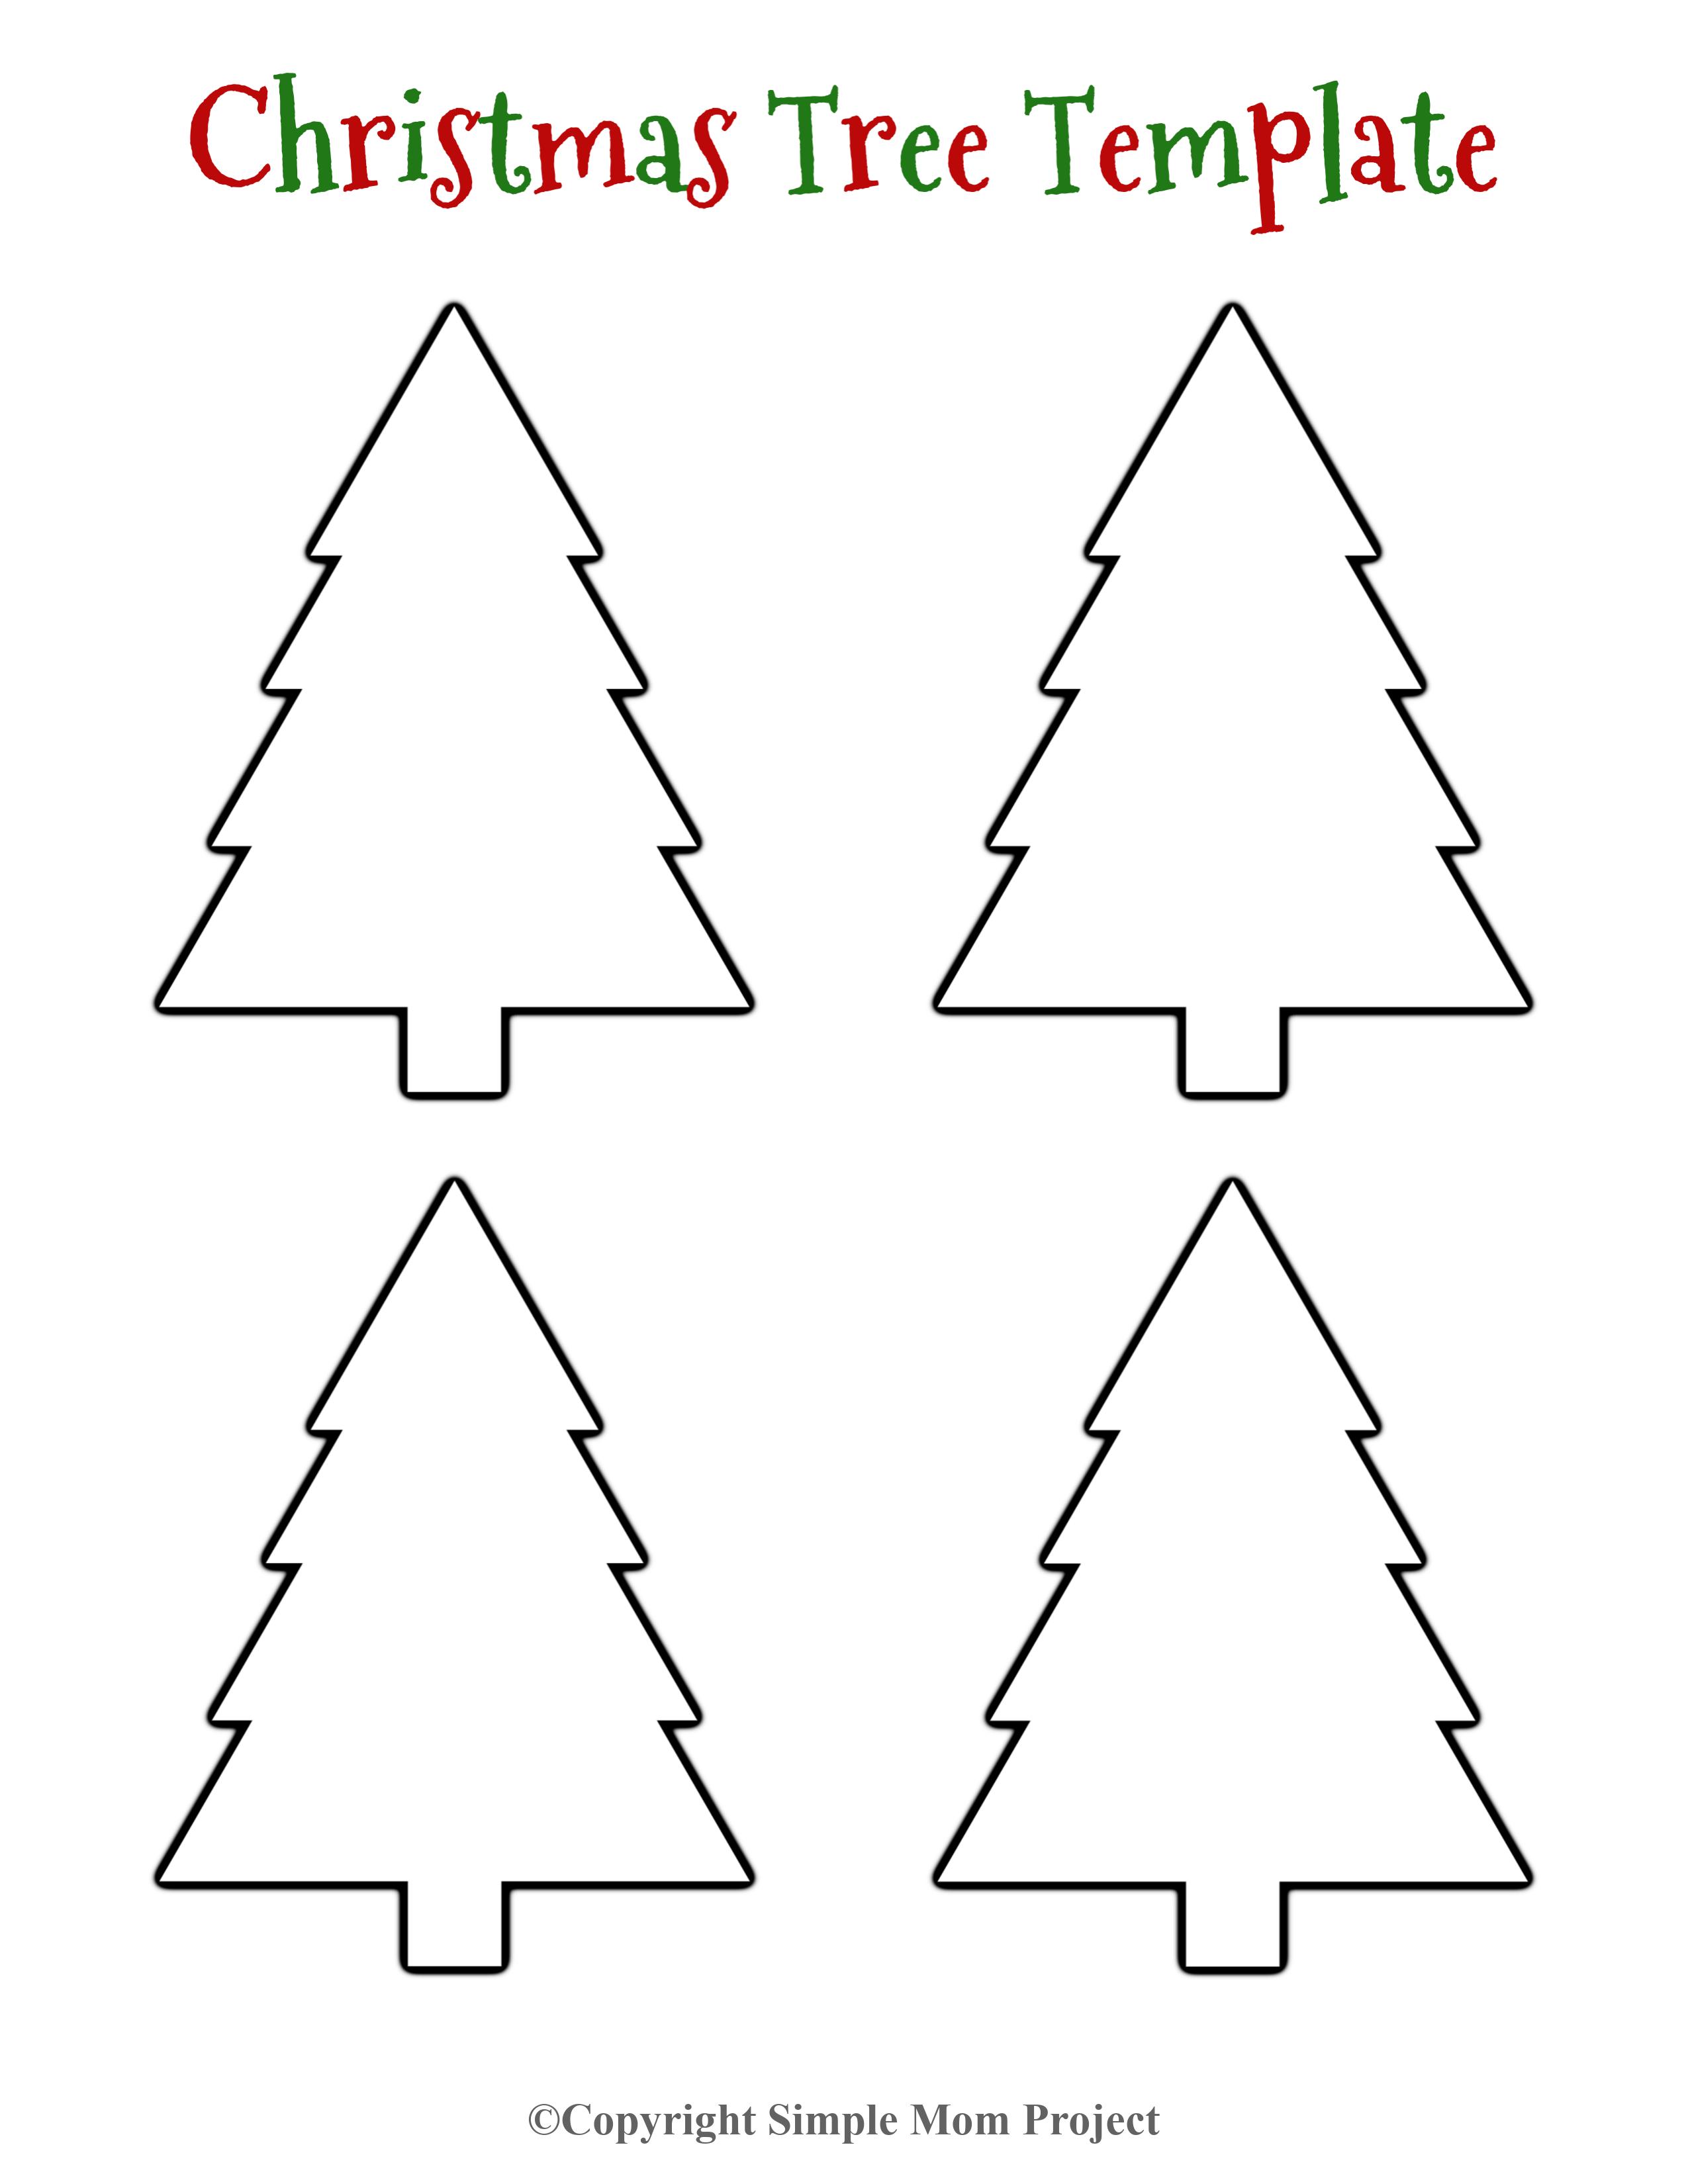 8 Free Printable Large Snowflake Templates Christmas Tree Template Christmas Tree Printable Tree Templates